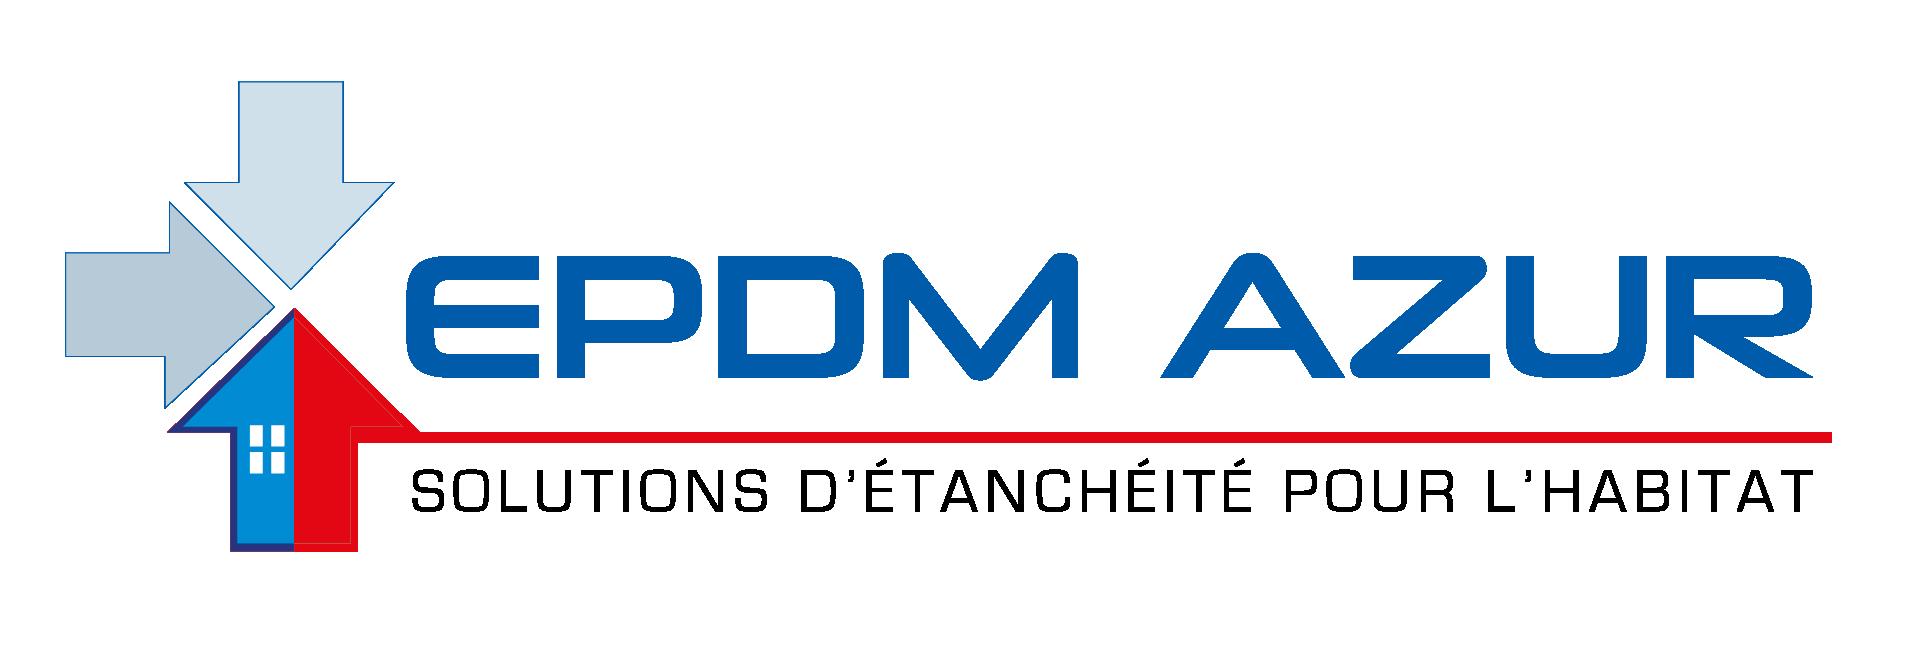 EPDM Azur